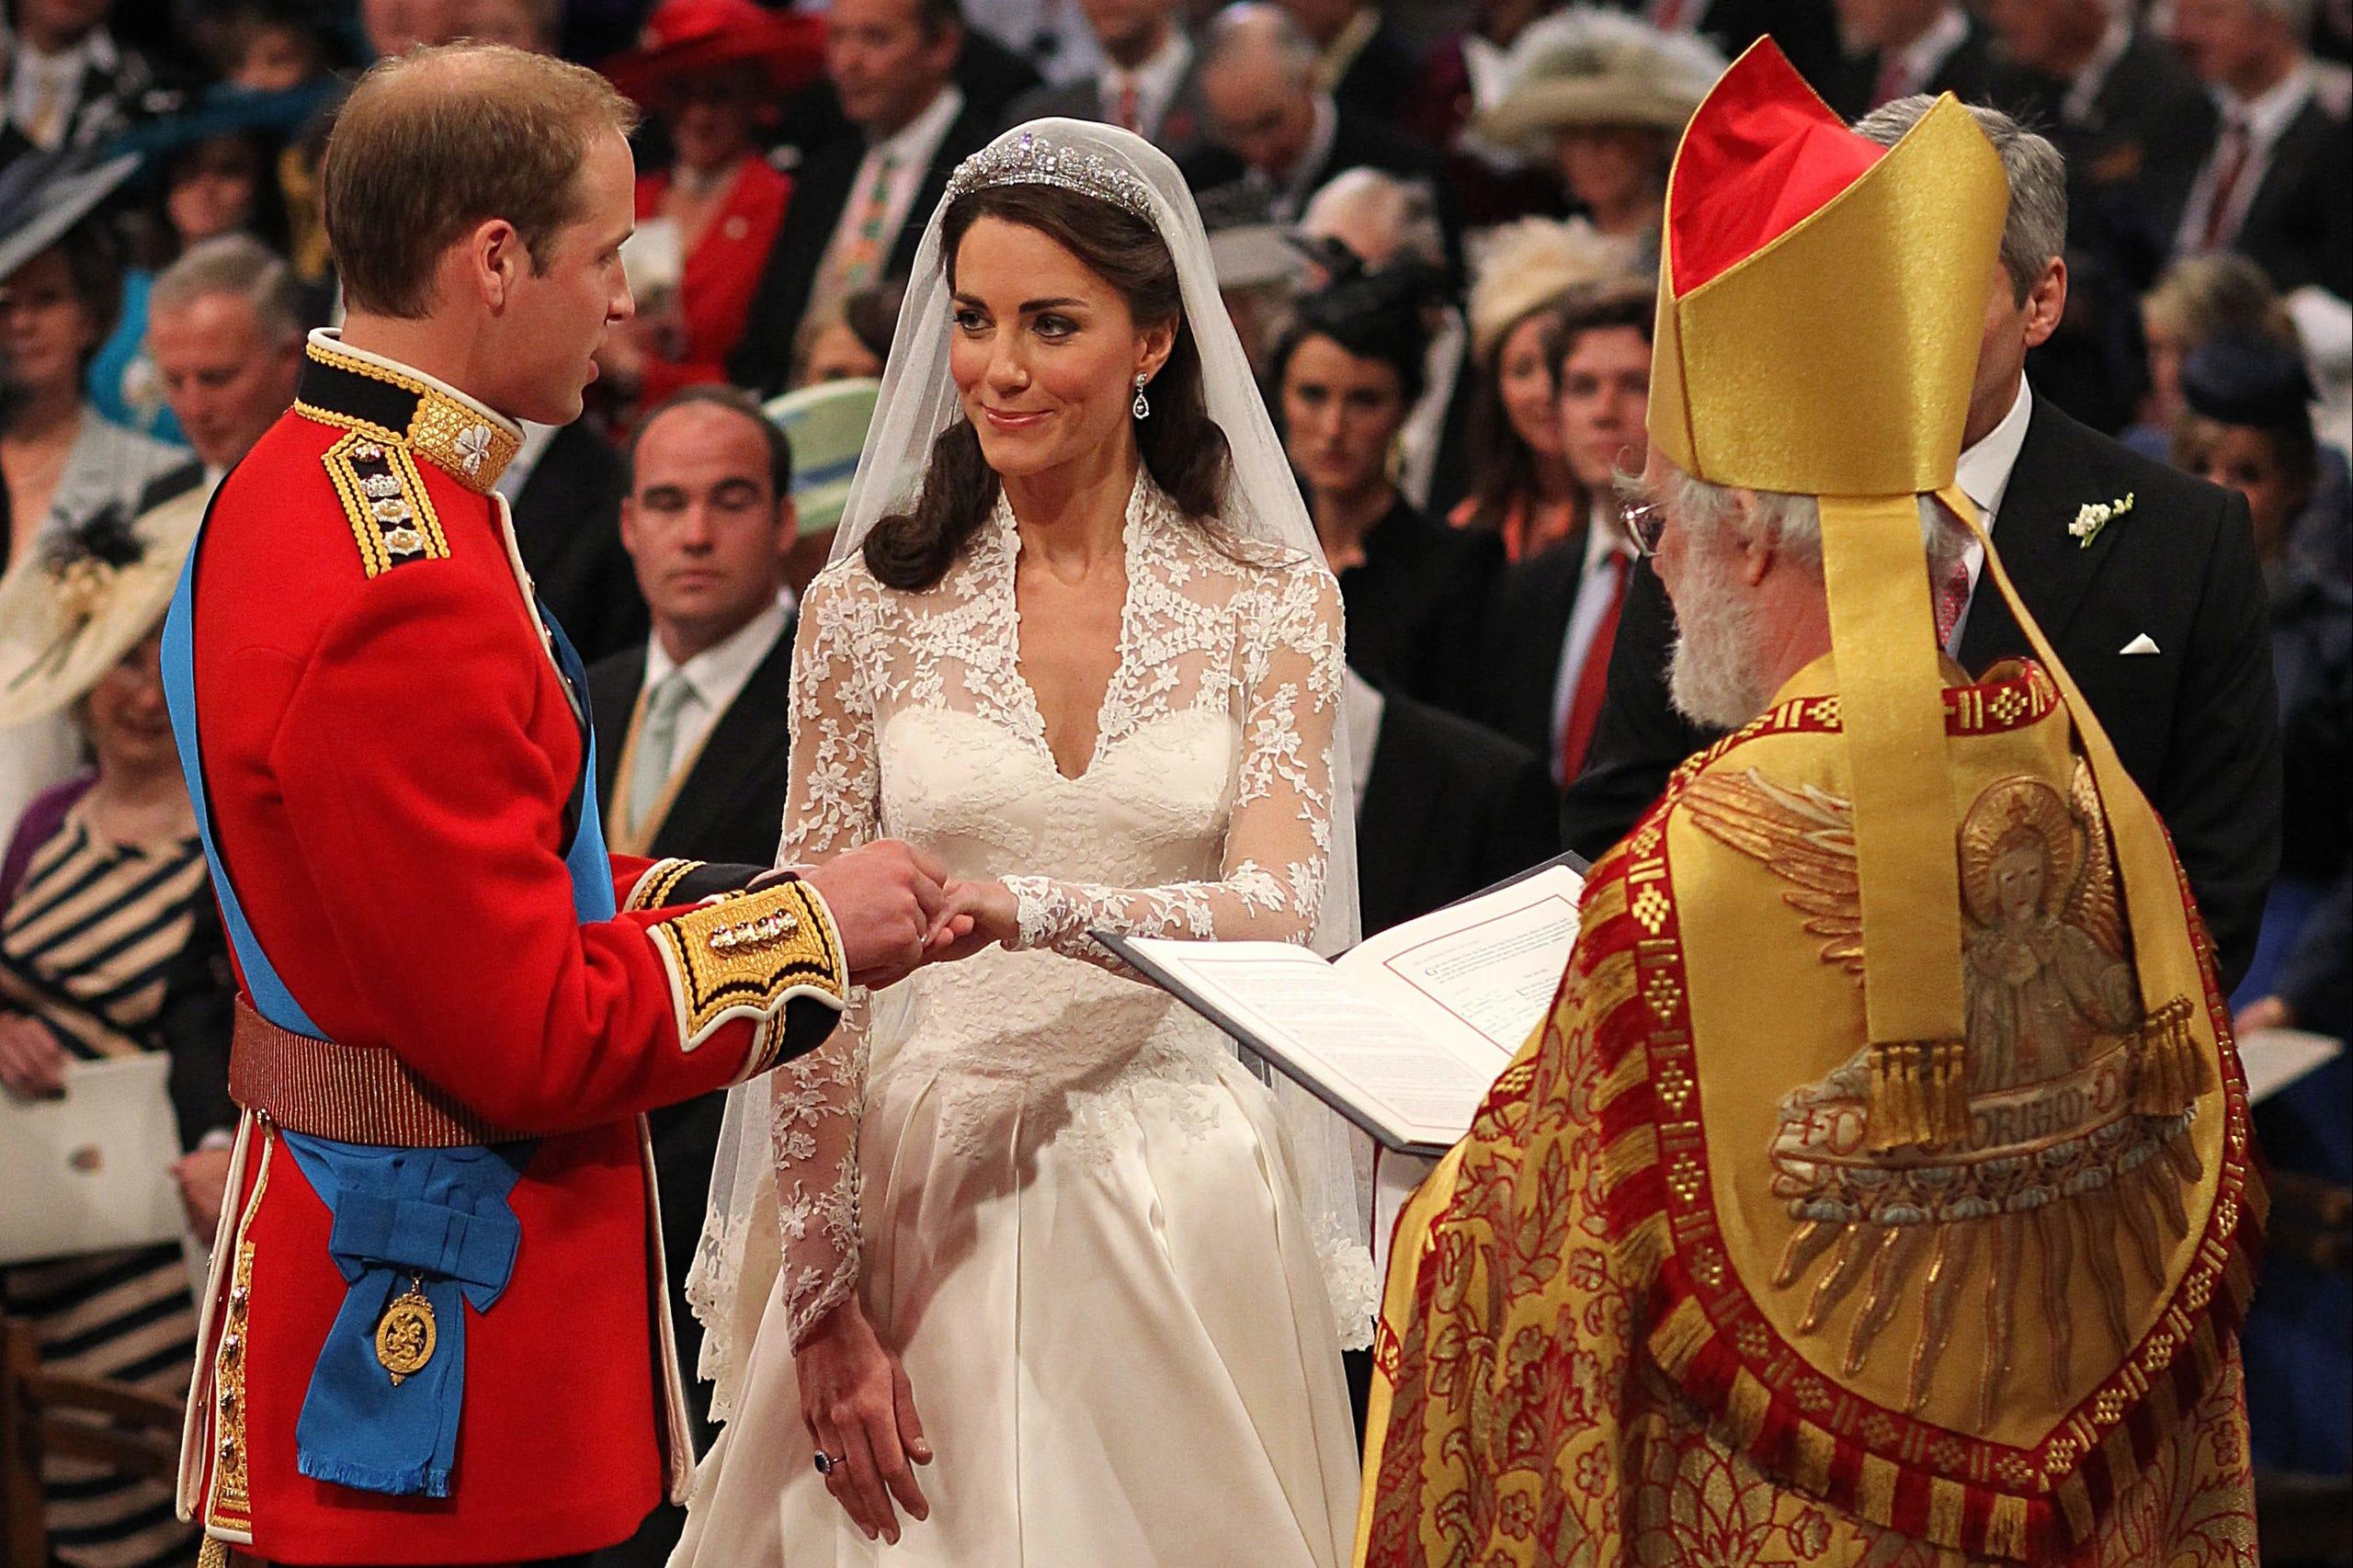 Prince William Wedding.Prince William And Duchess Kate S Stunning Wedding Photos